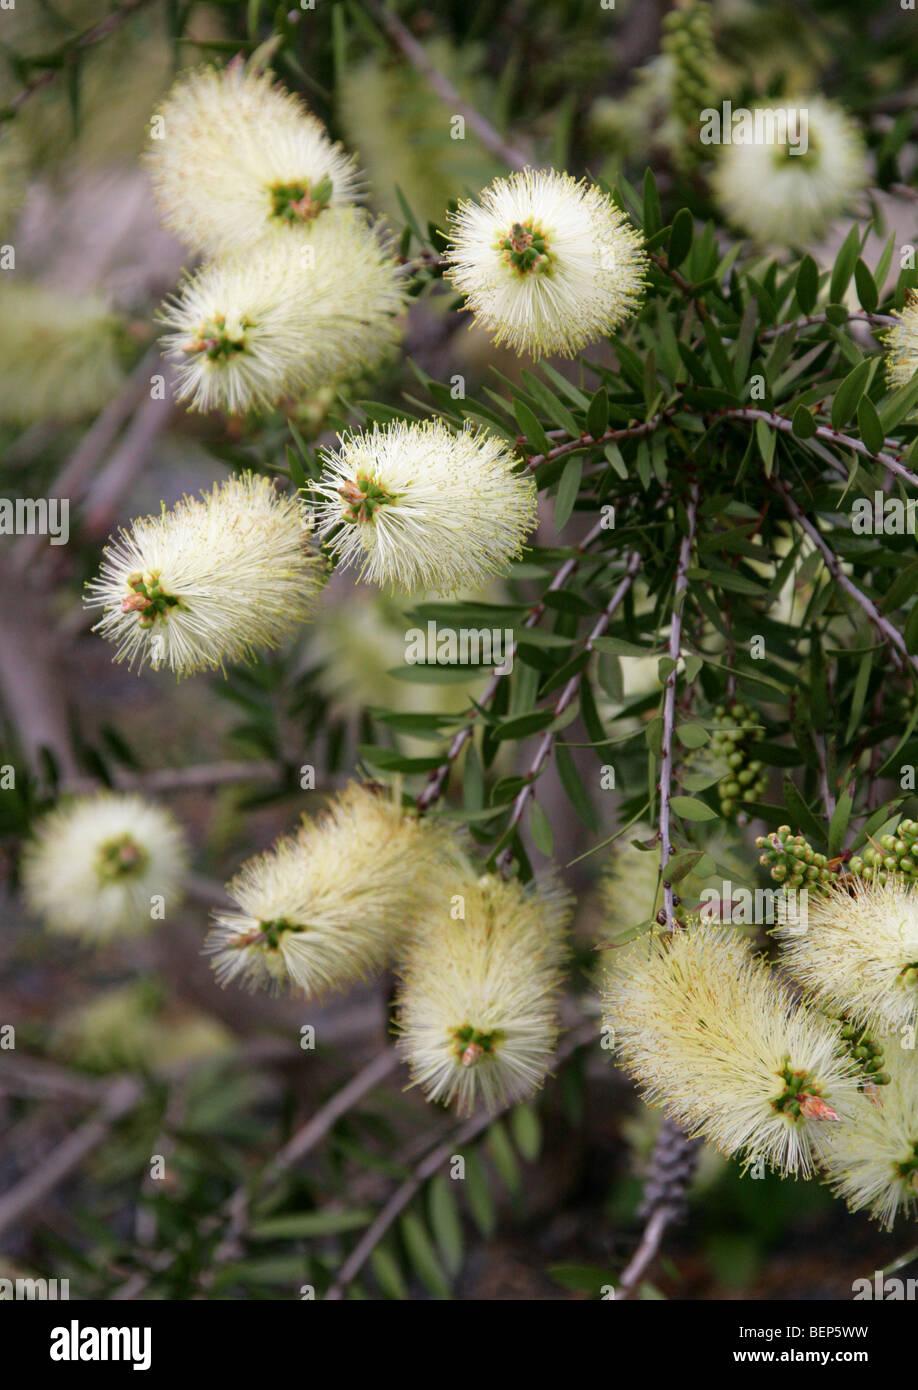 Bottlebrush, Callistemon viridiflorus, Myrtaceae, Tasmania, Australia - Stock Image